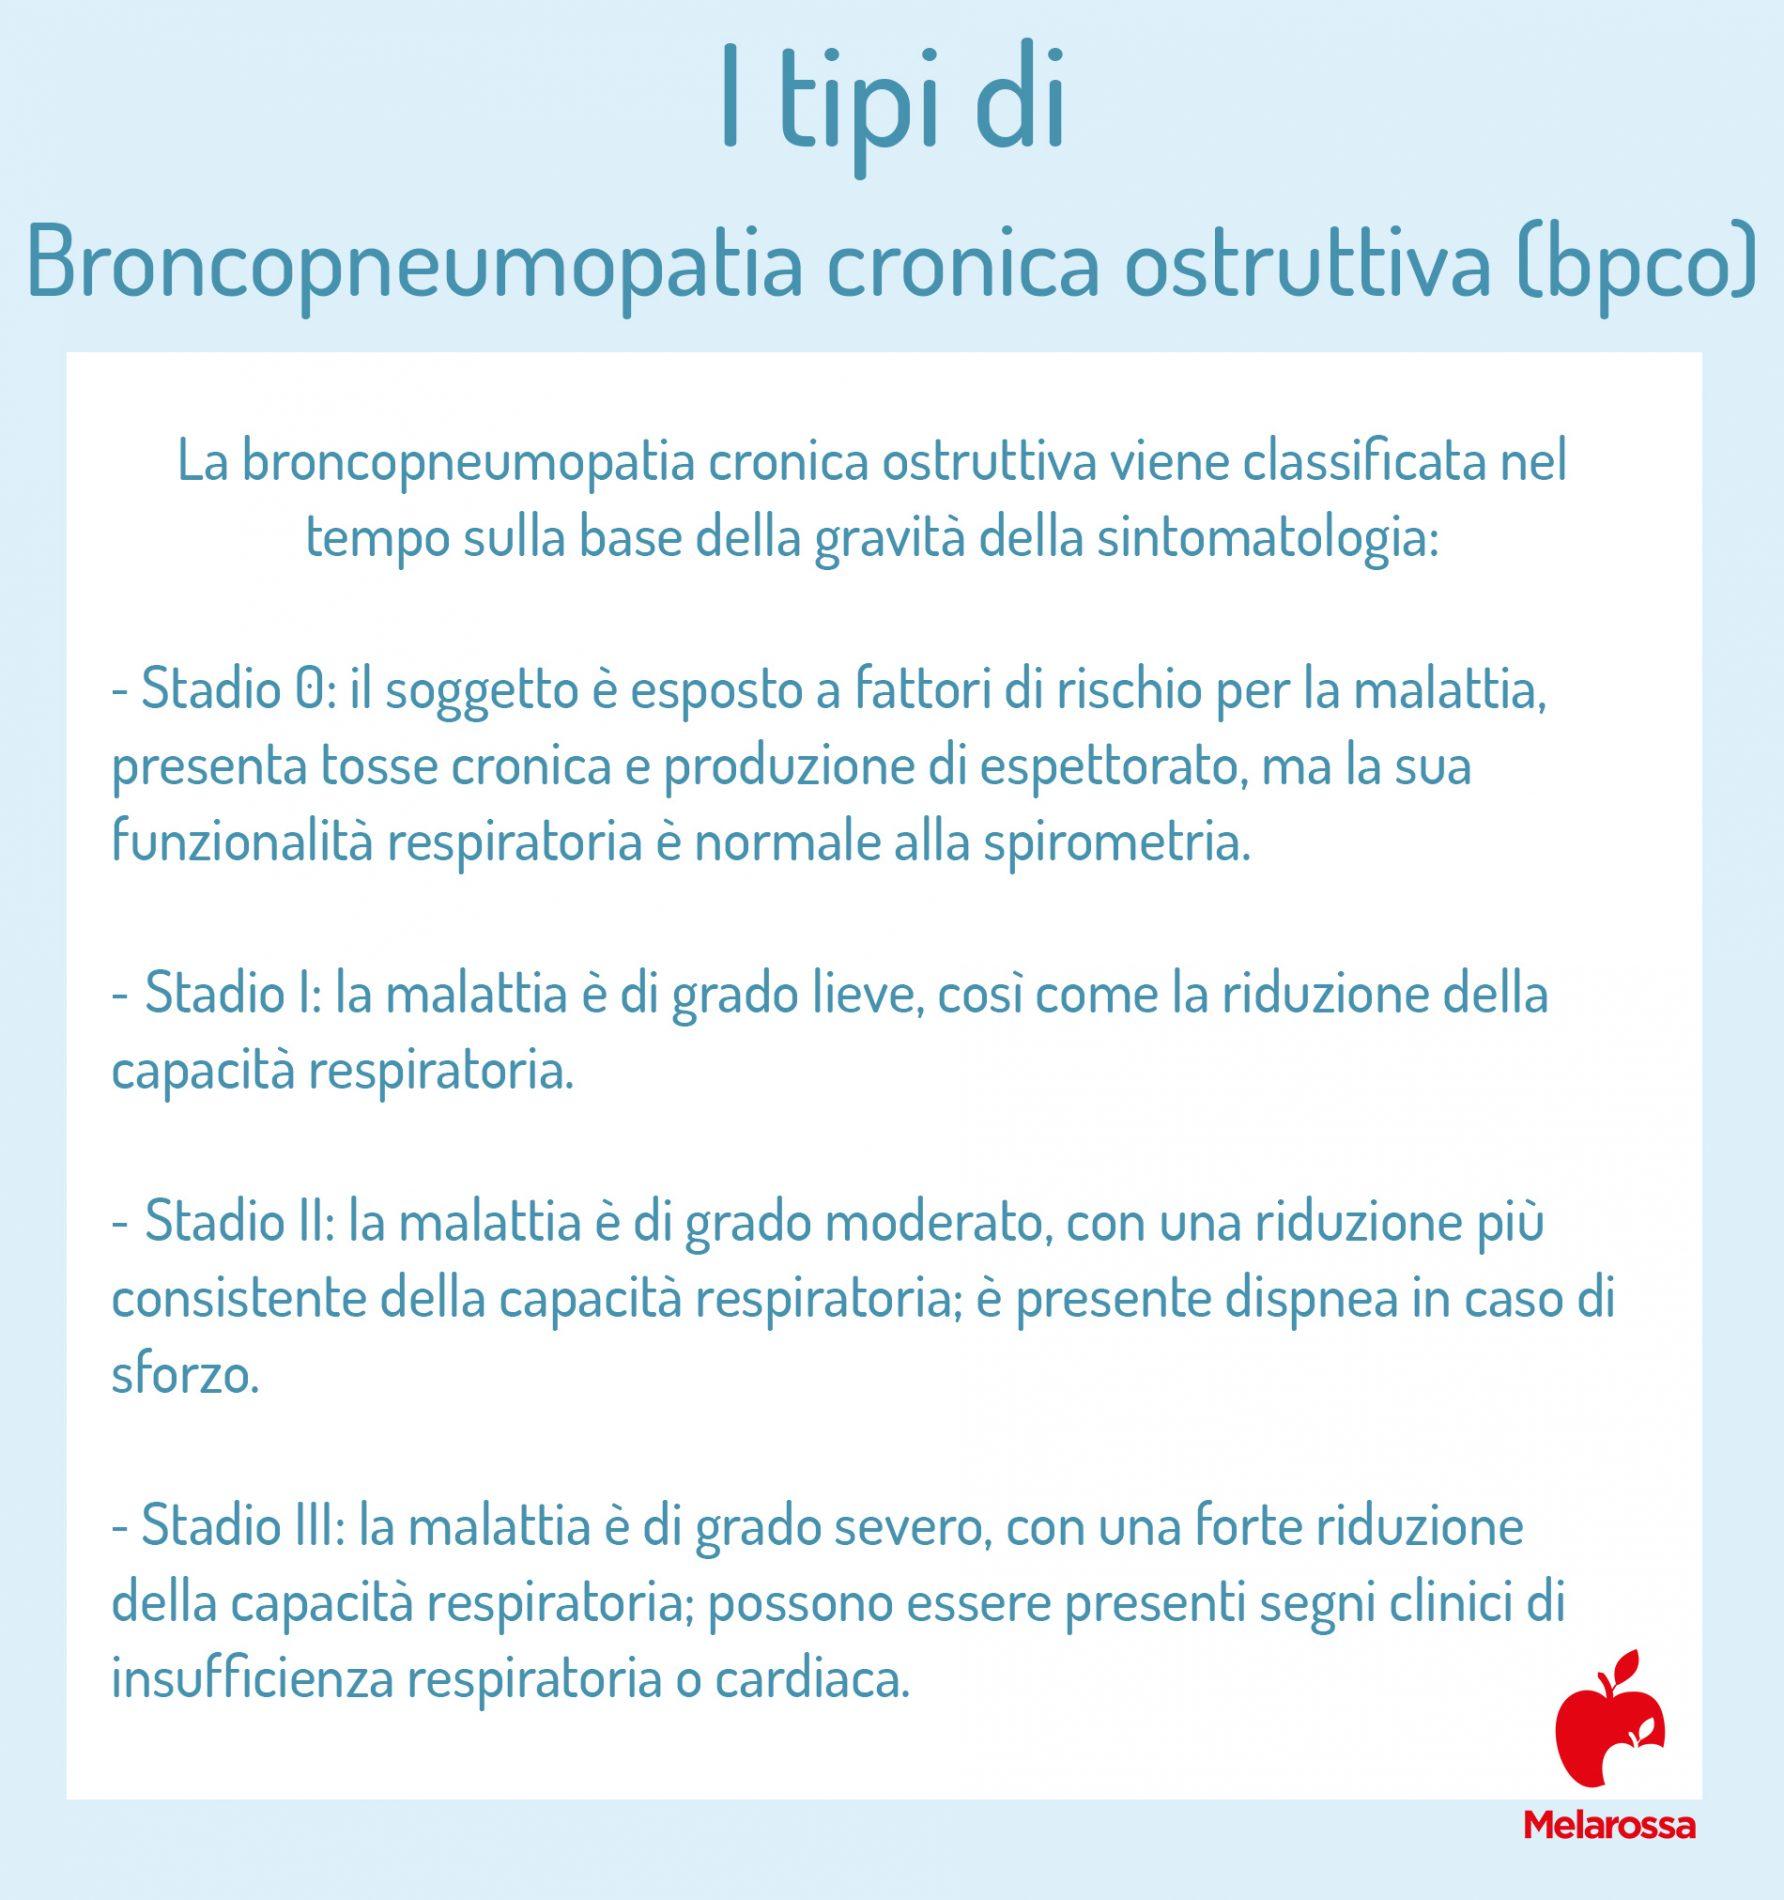 Broncopneumopatia cronica ostruttiva: tipi